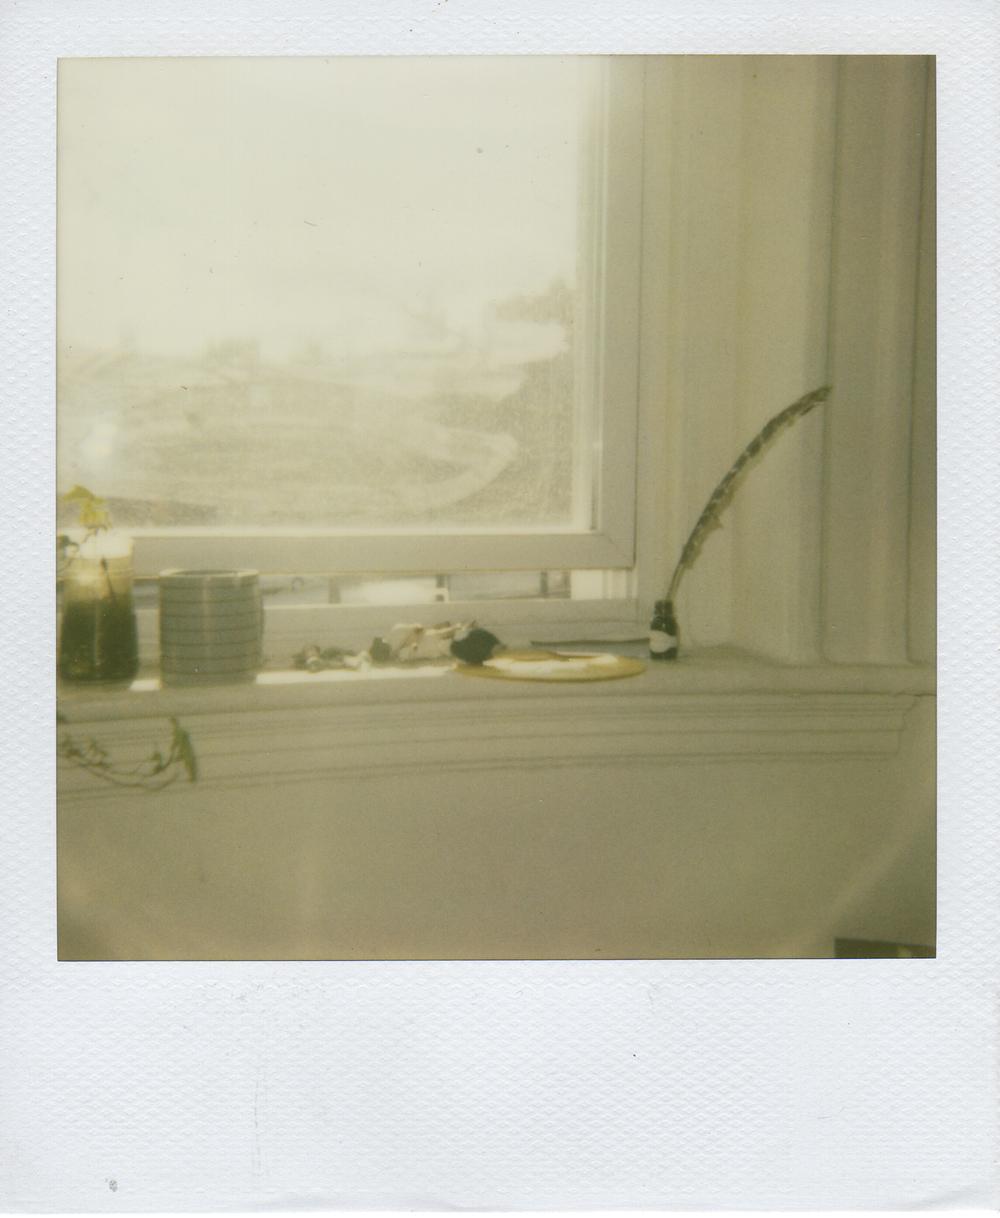 jlaurence-polaroid-006.jpg